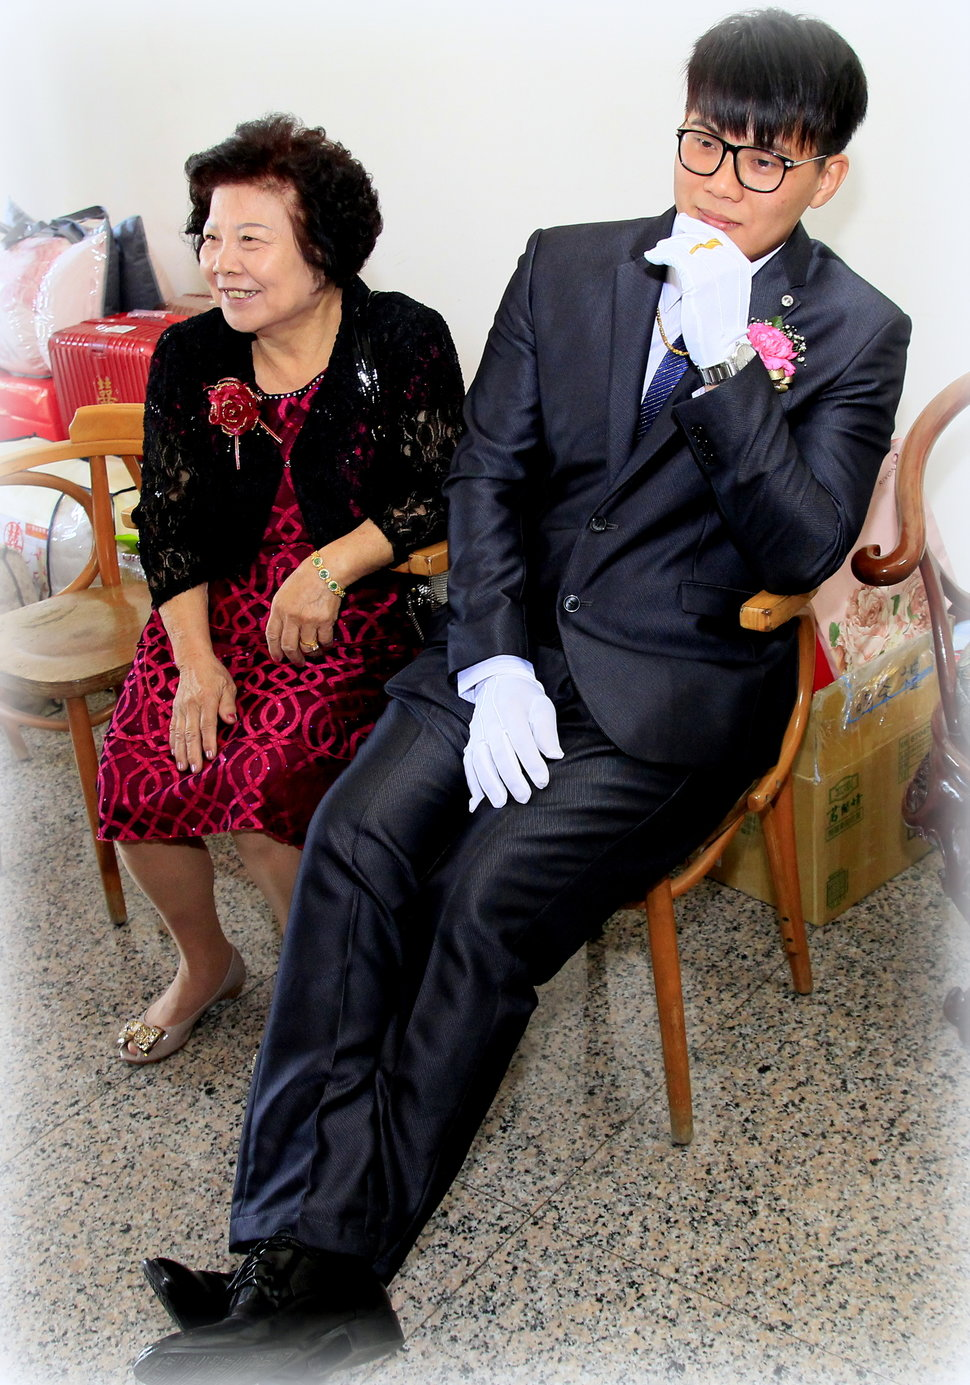 _MG_9200 - Yusin 攝影~與您同心祝福您永結同心 - 結婚吧